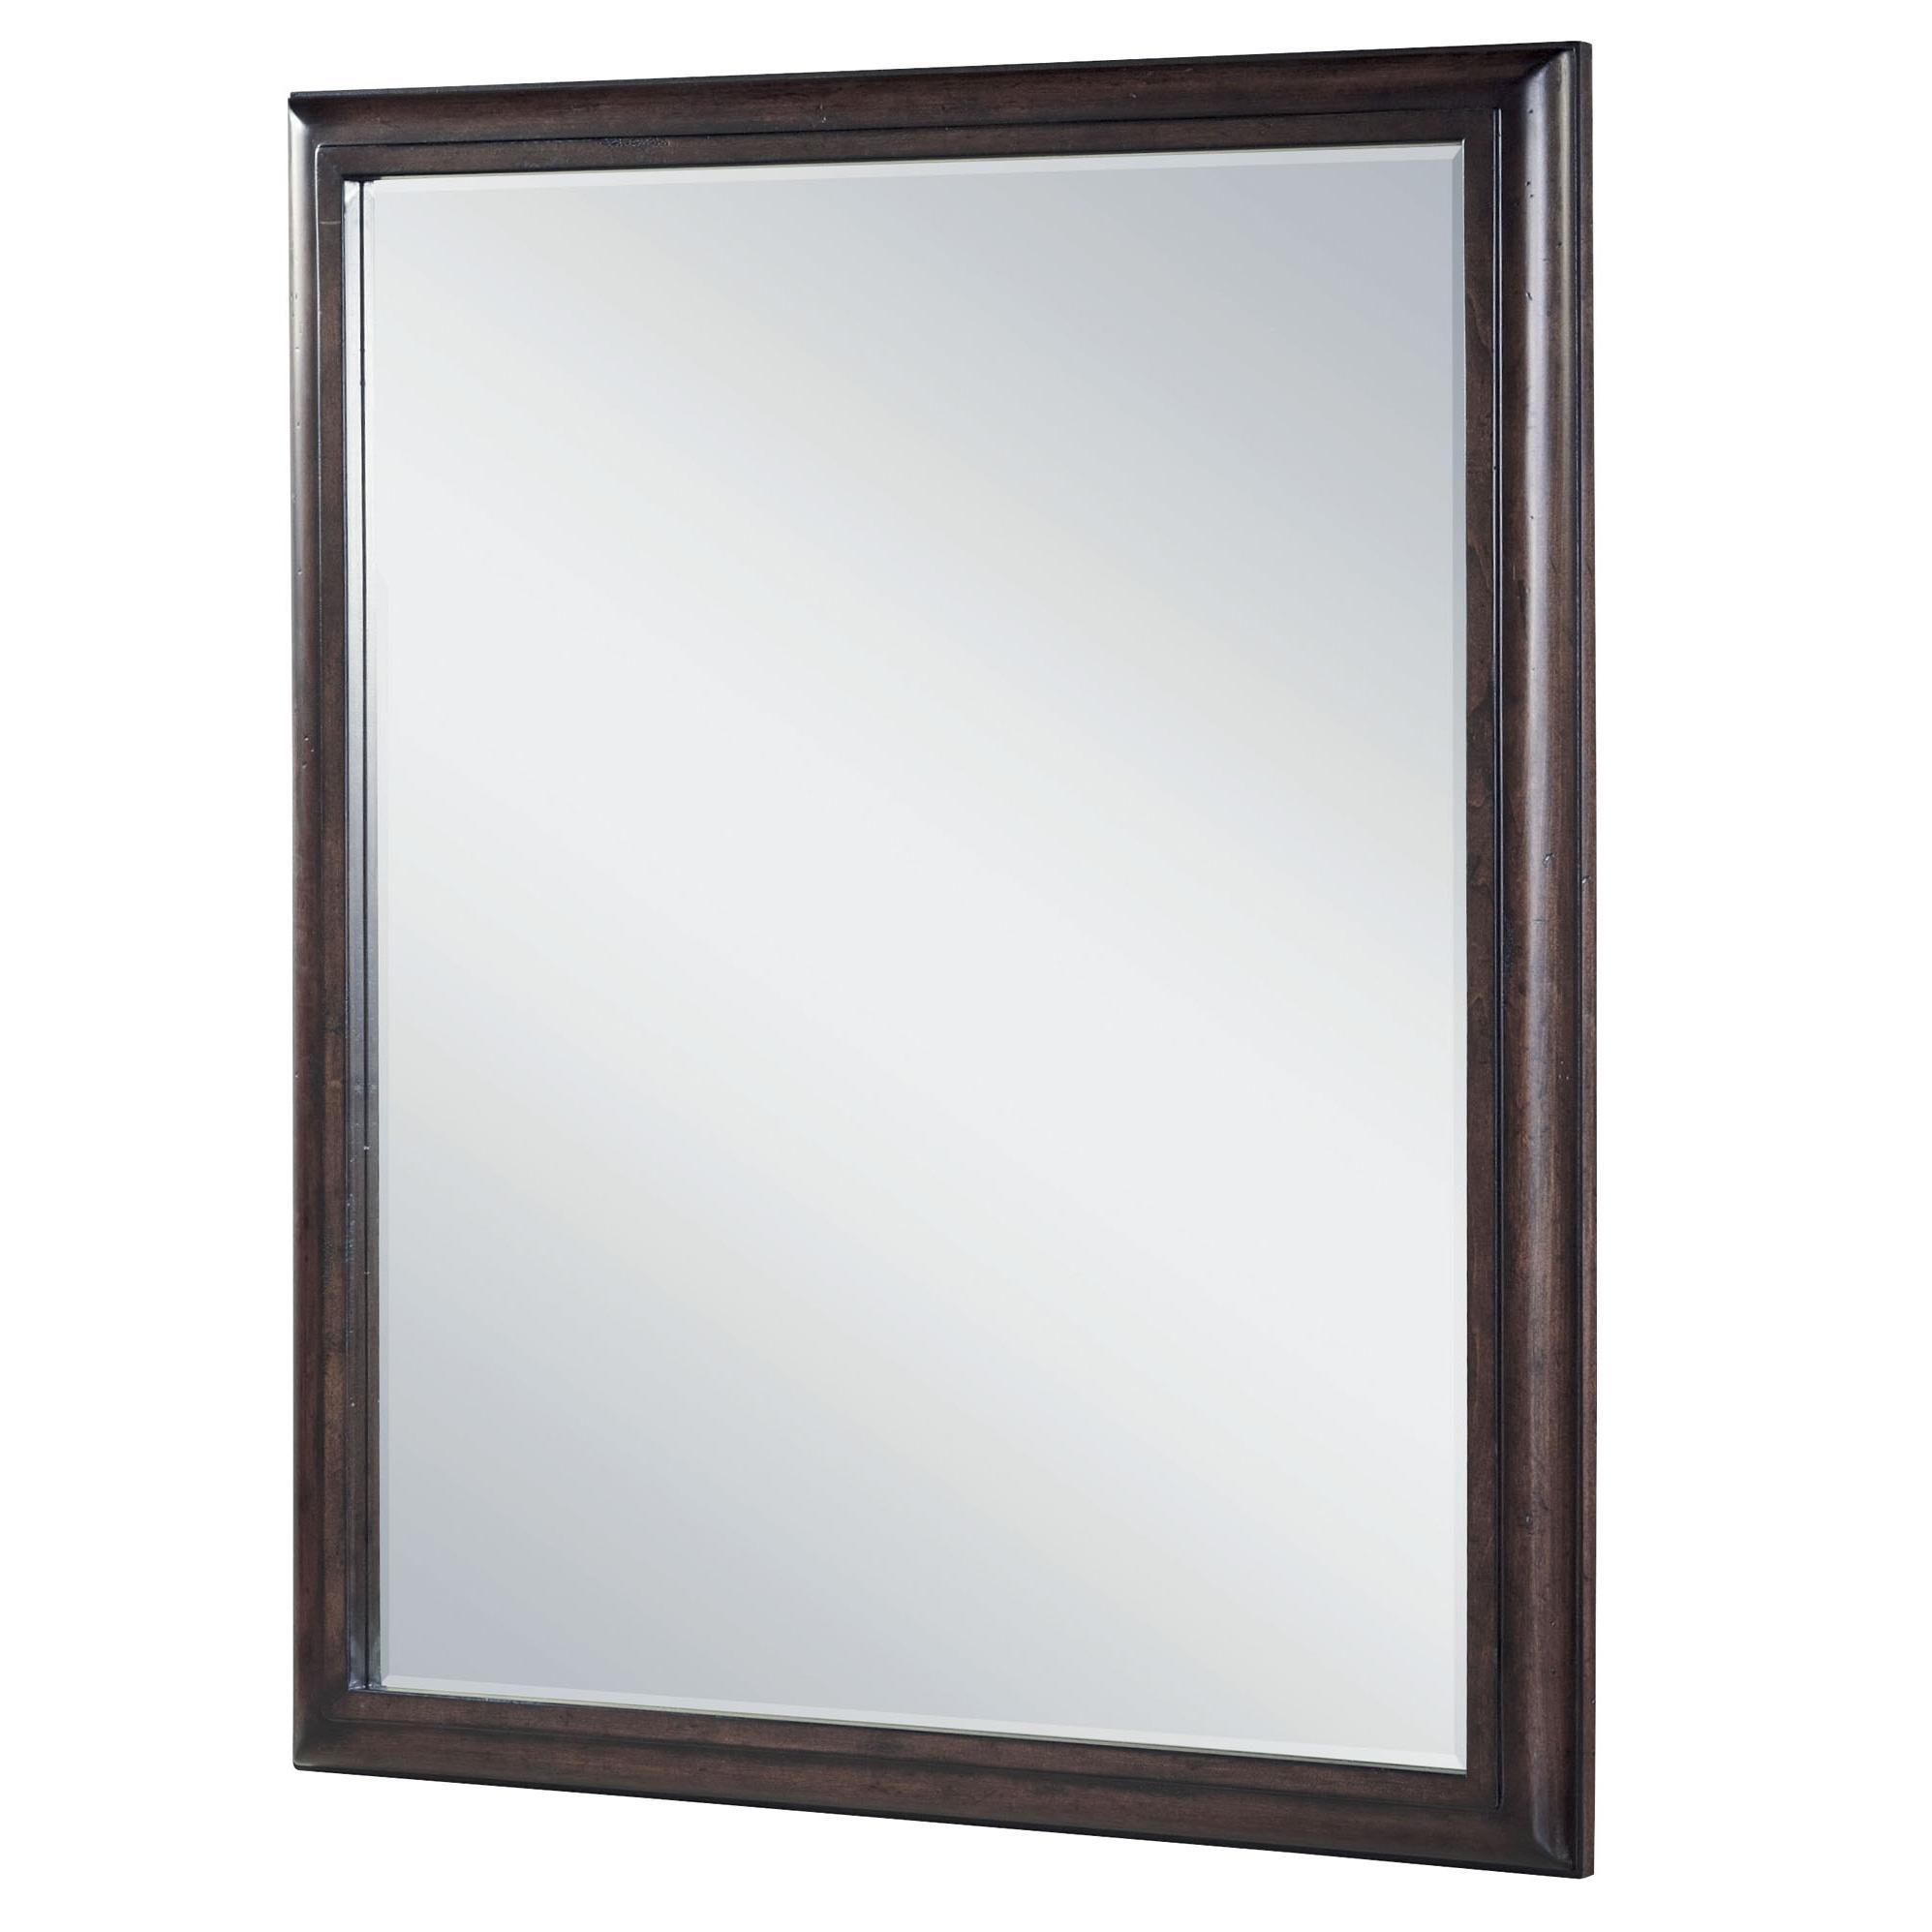 Morris Home Furnishings Pine Valley Pine Valley Mirror - Item Number: 2391032